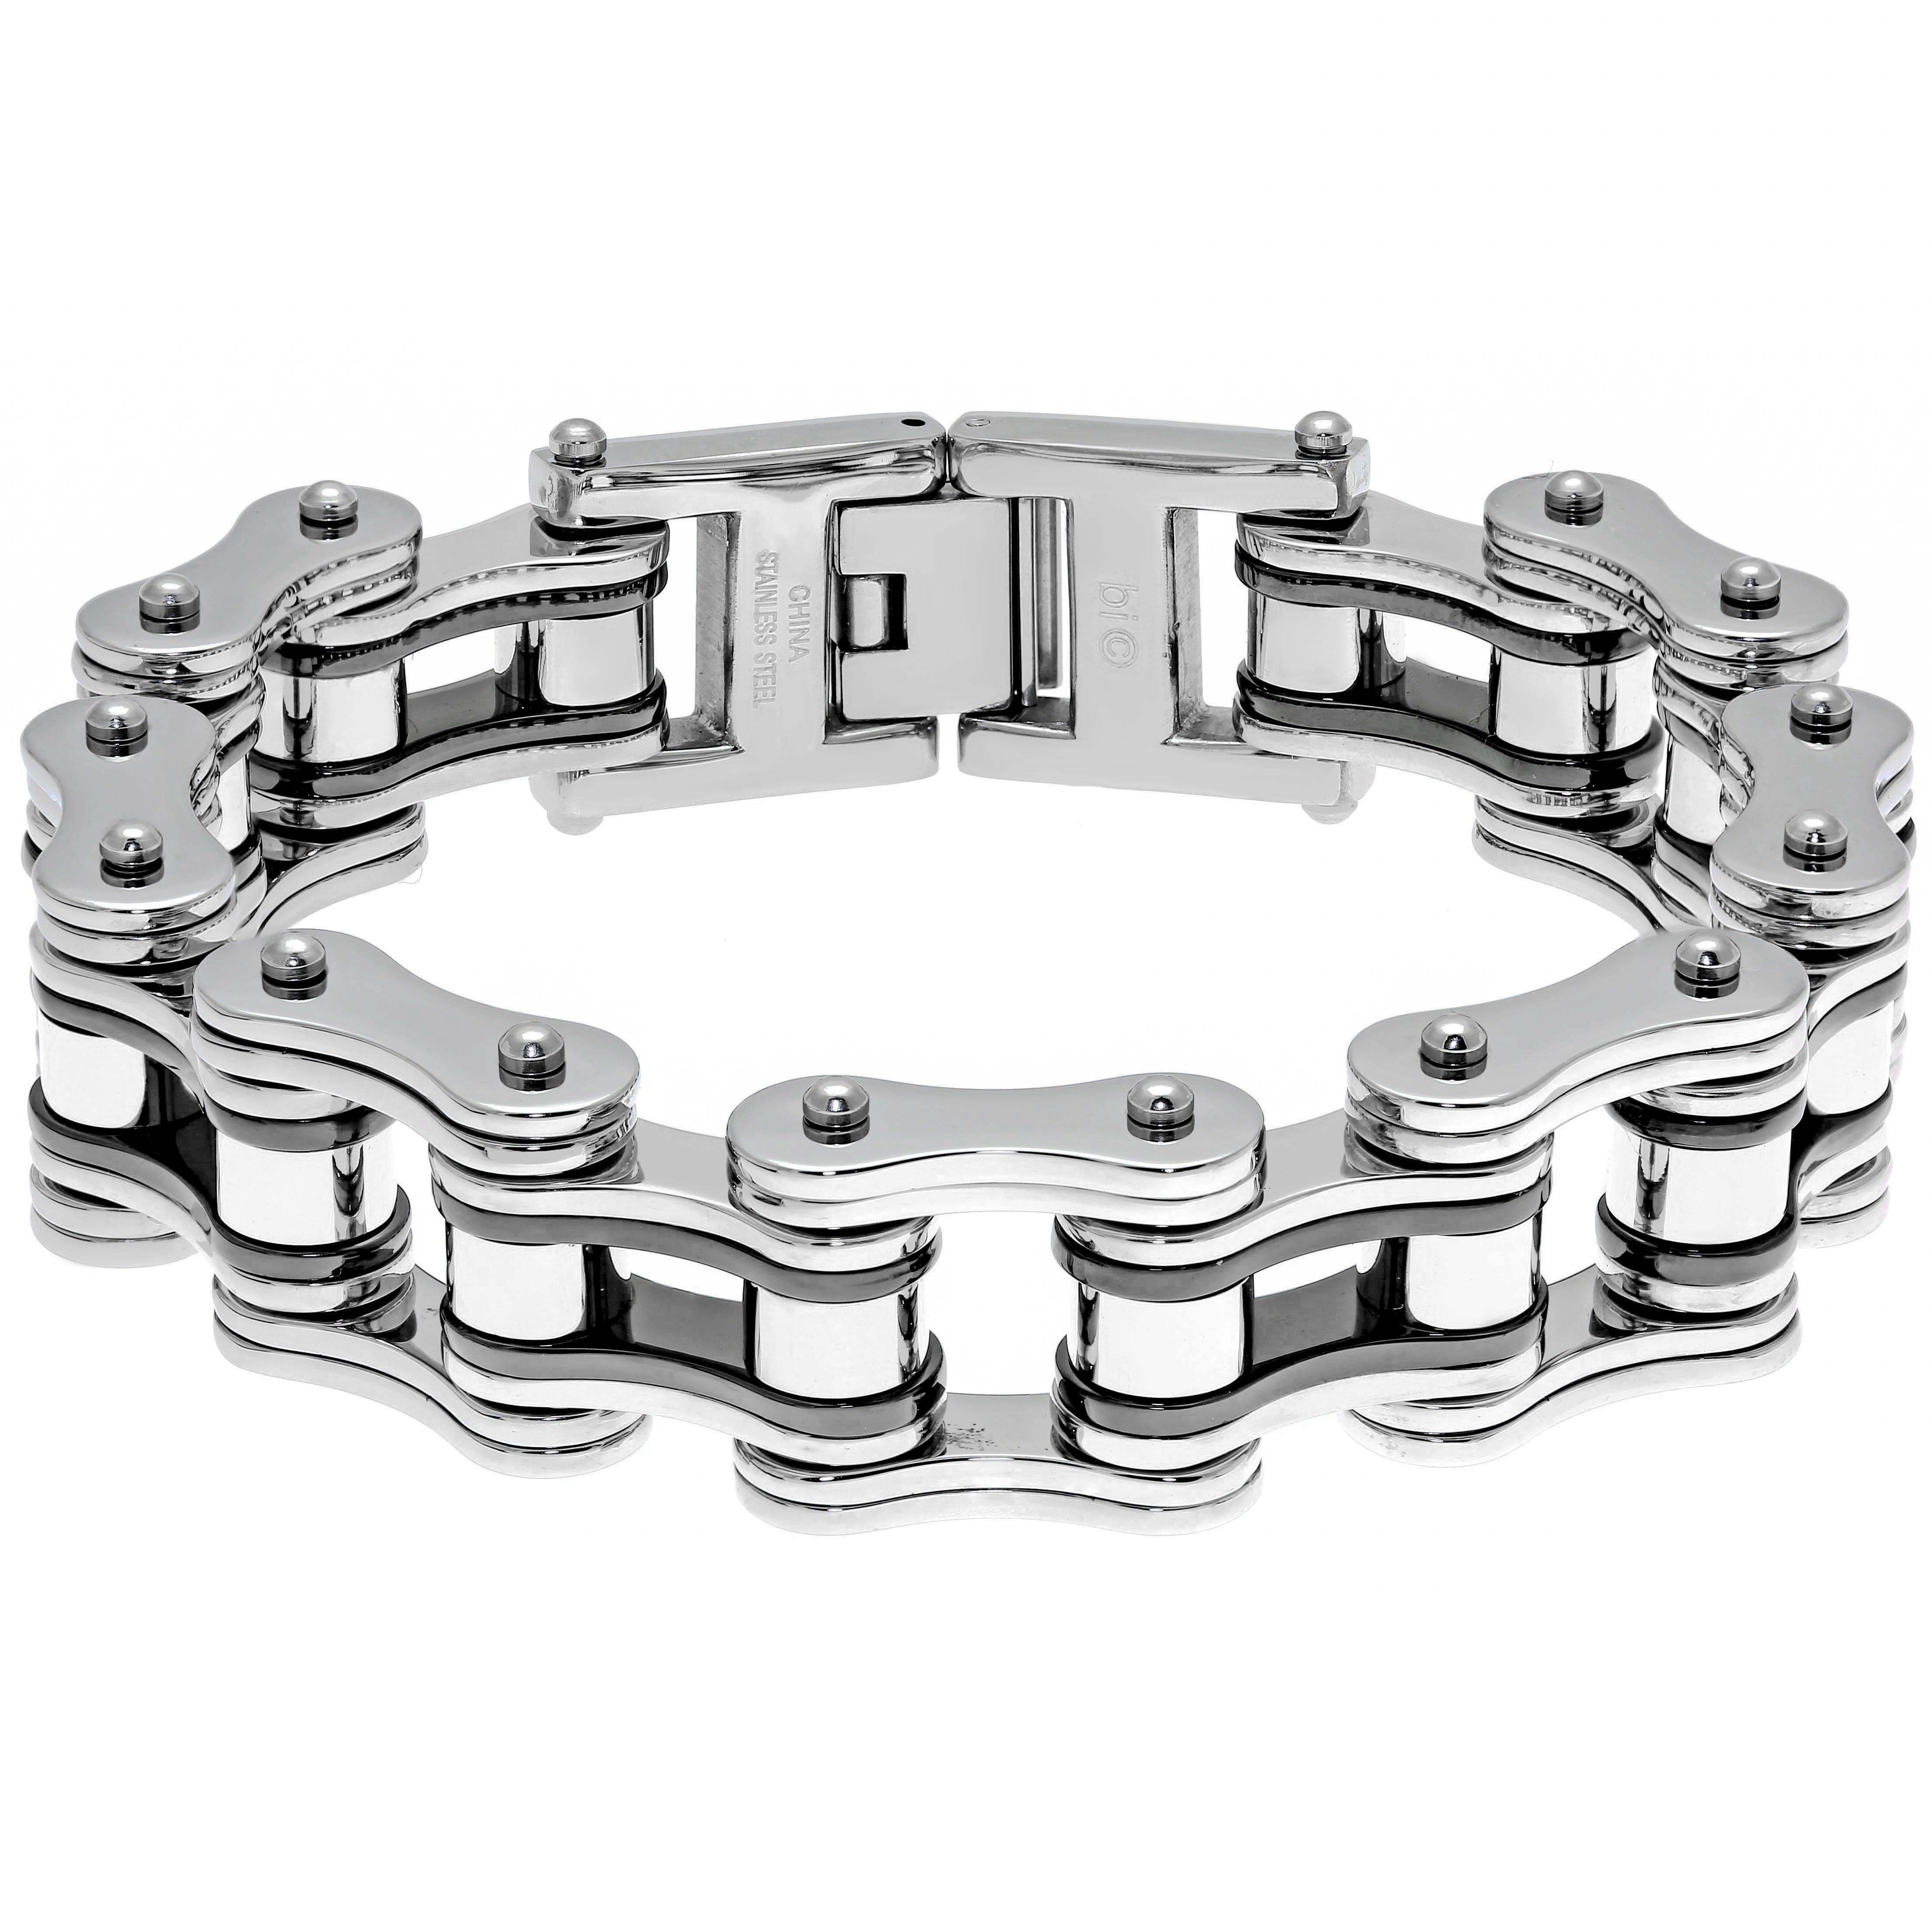 Men's Stainless Steel Motorcycle Chain Bracelet